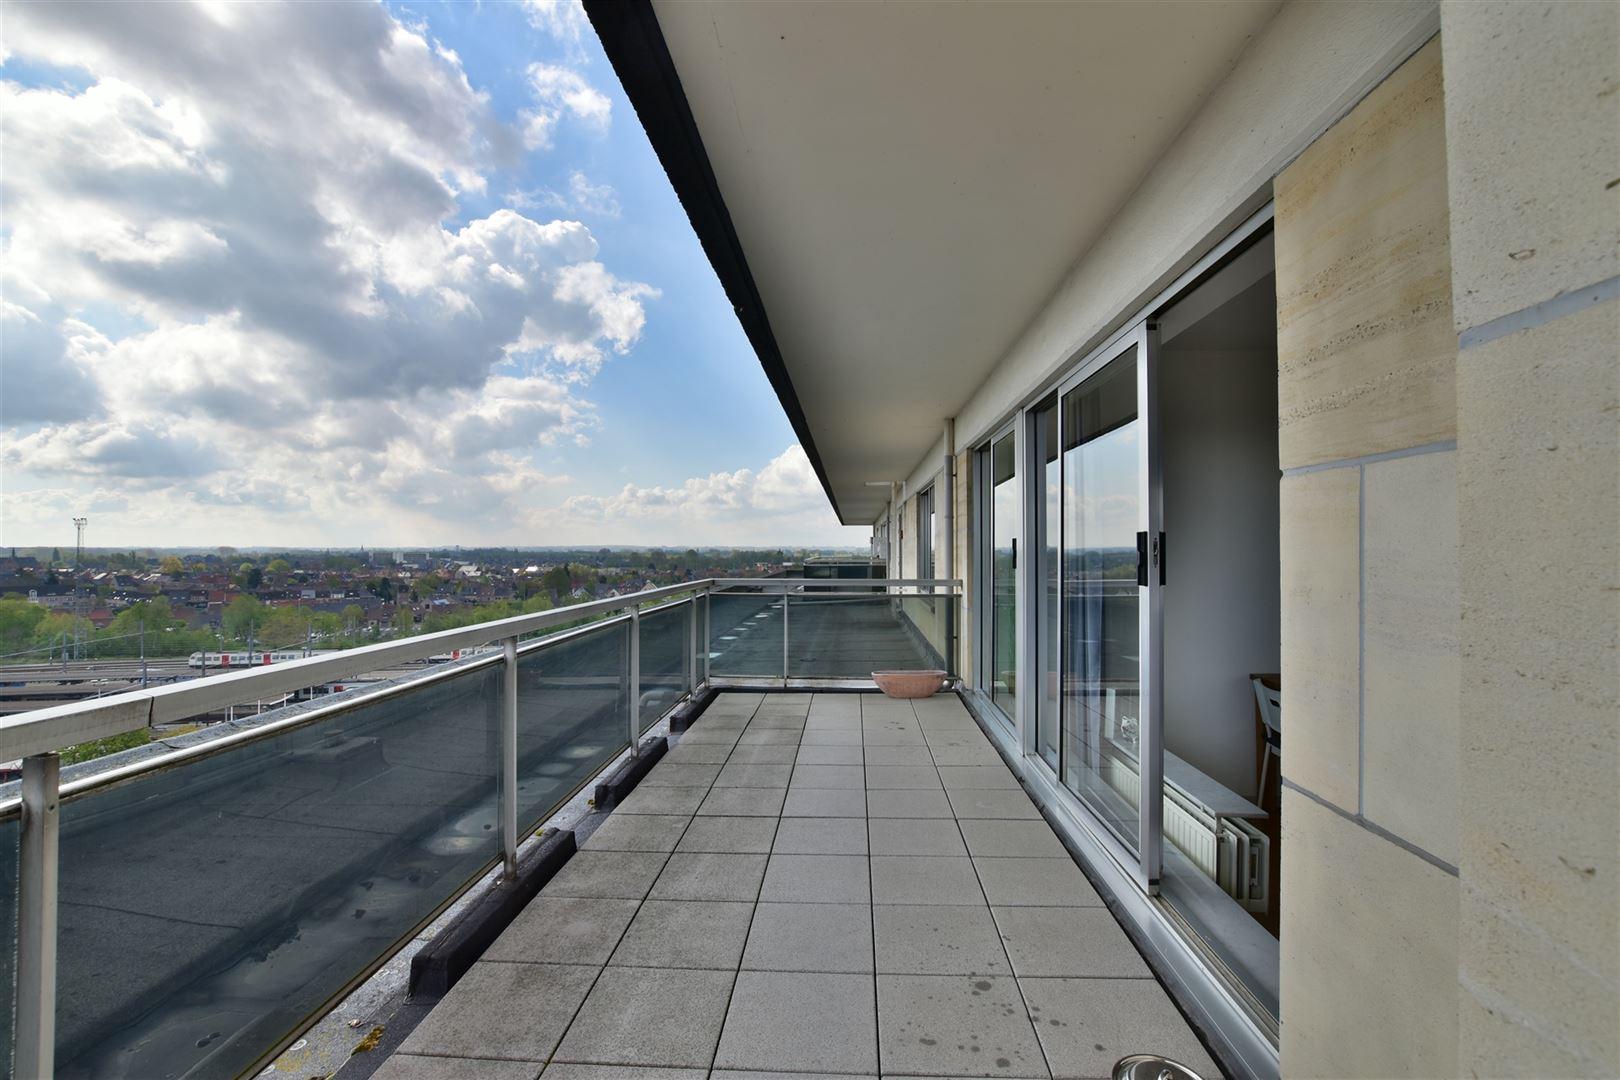 Foto 7 : Appartement te 9200 DENDERMONDE (België) - Prijs € 169.000